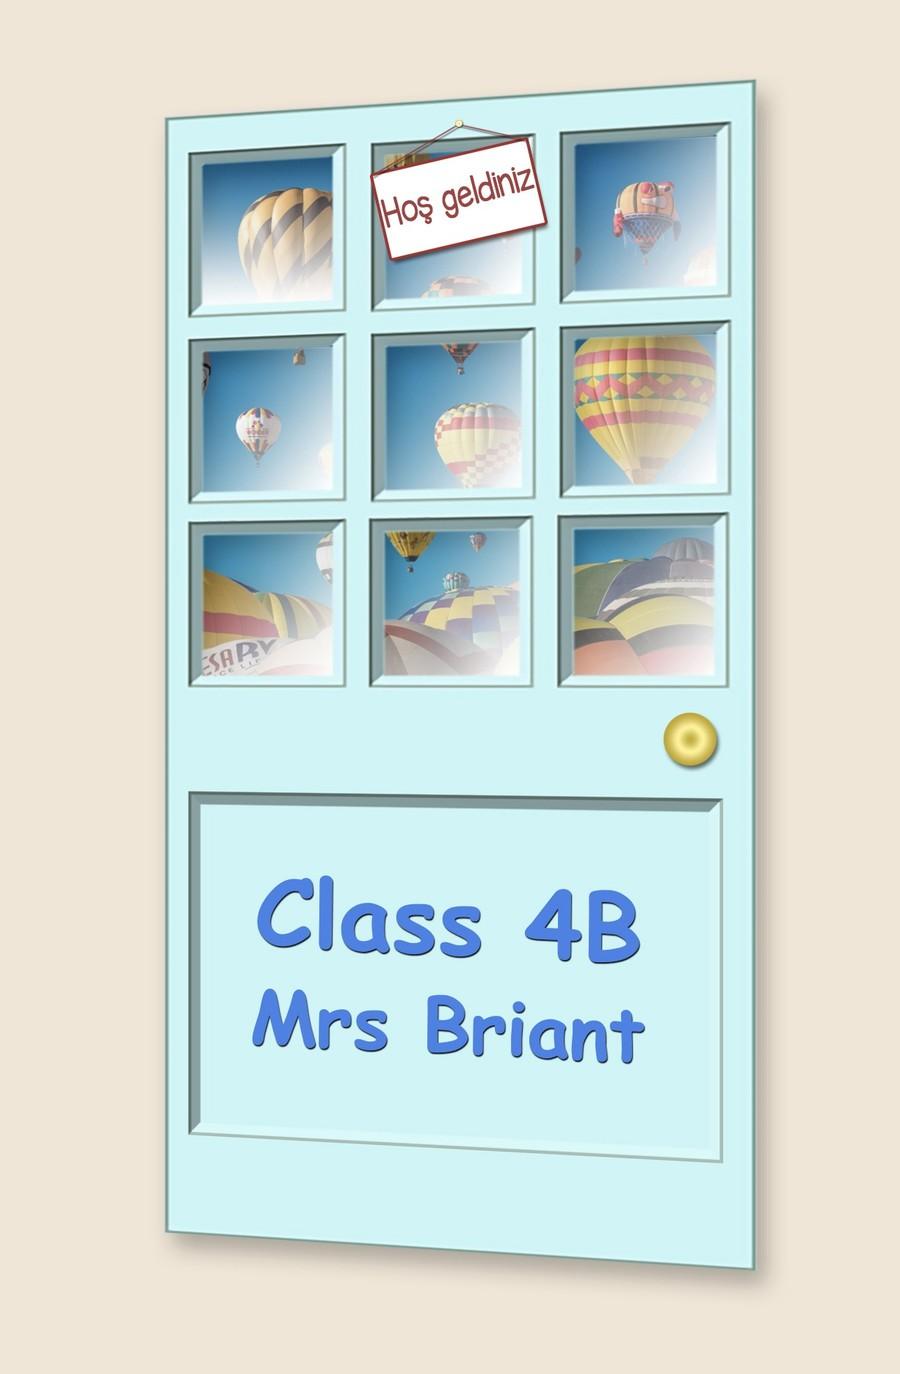 Go to Class 4B